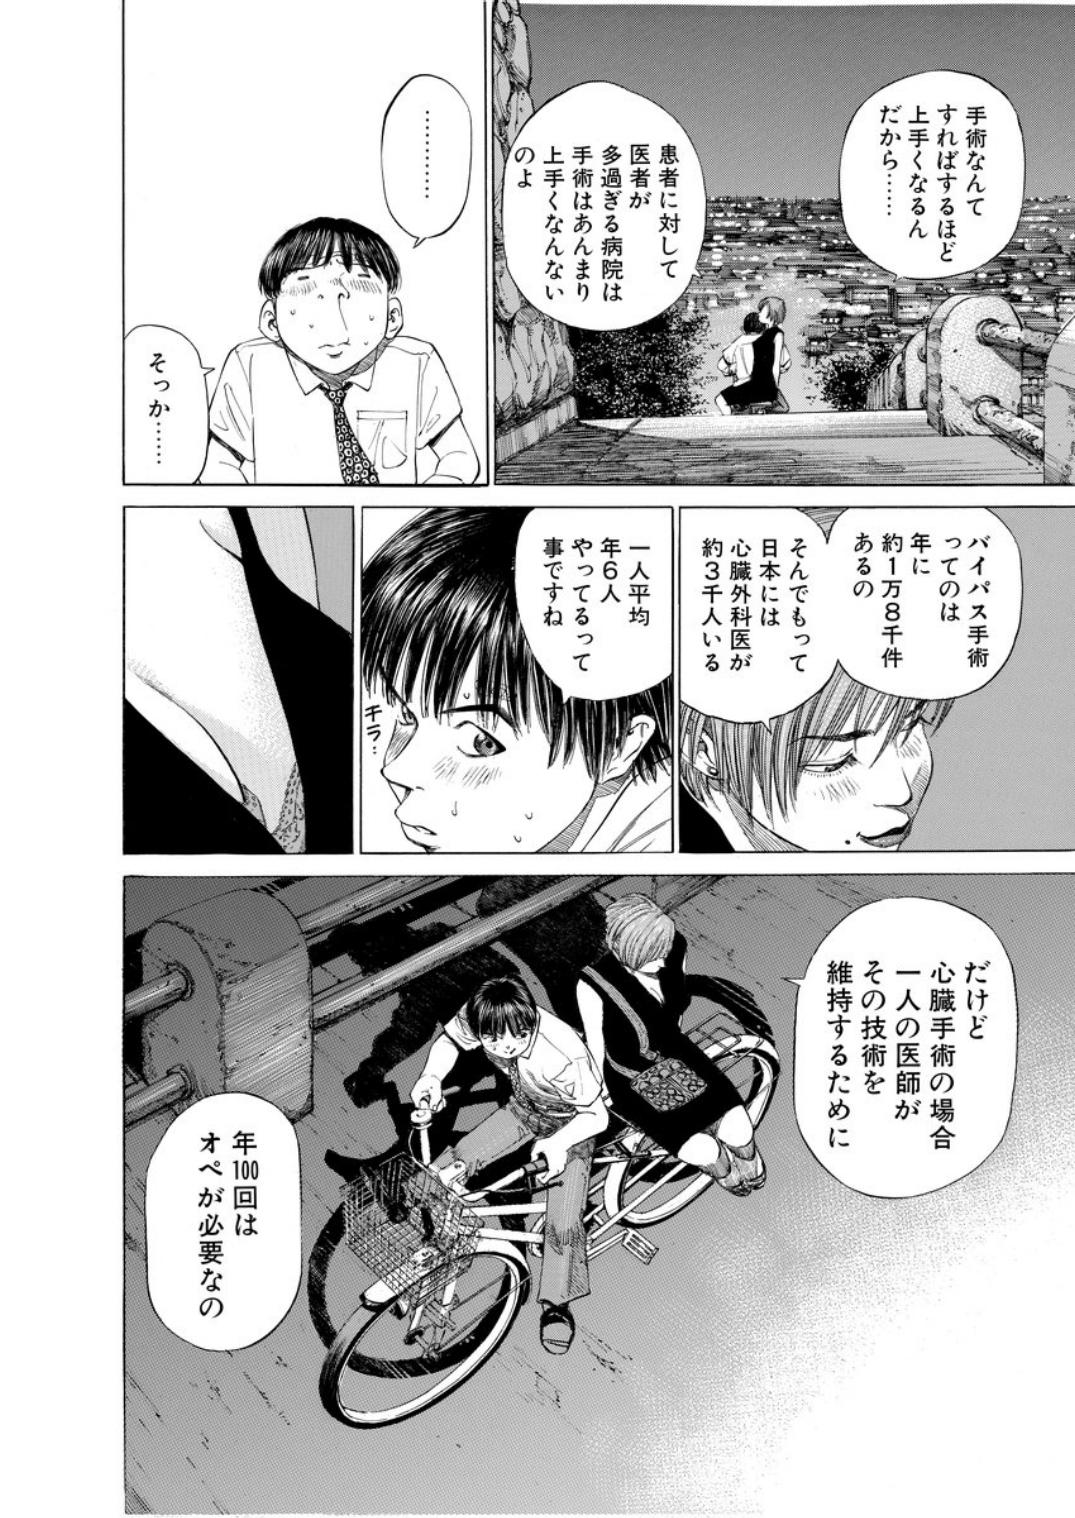 001bj_page-0206.jpg